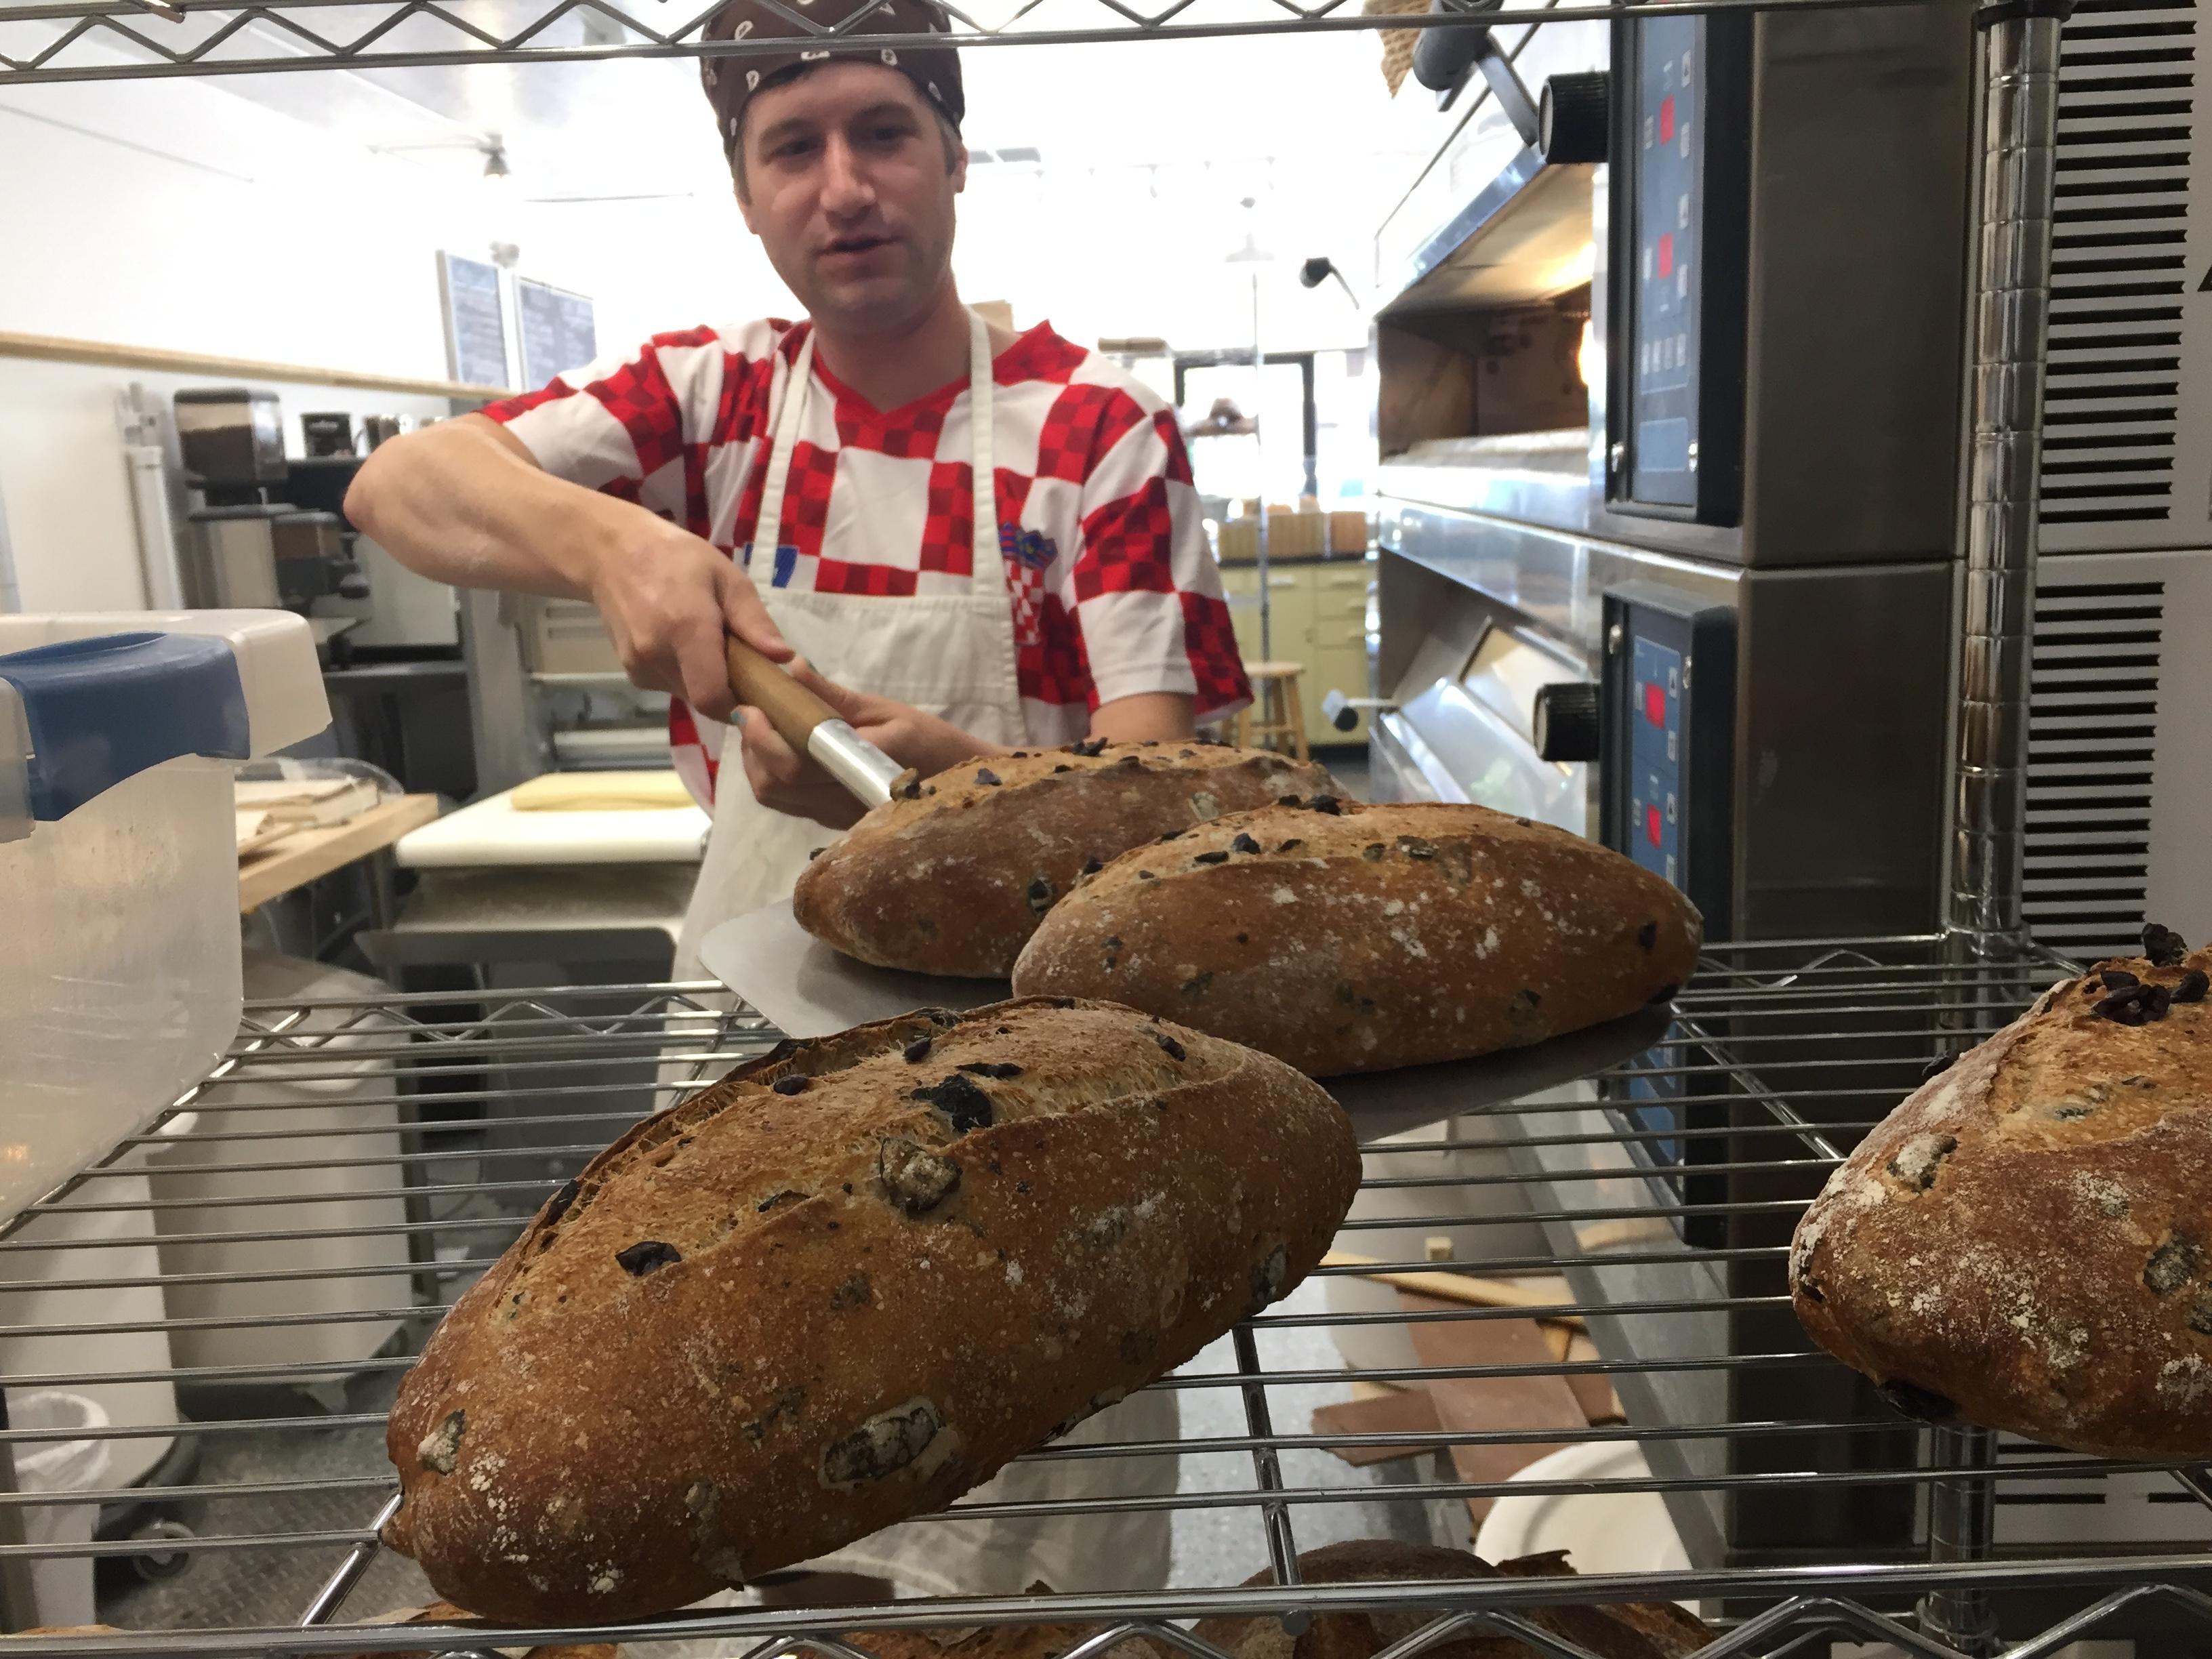 Tyler unloading bread